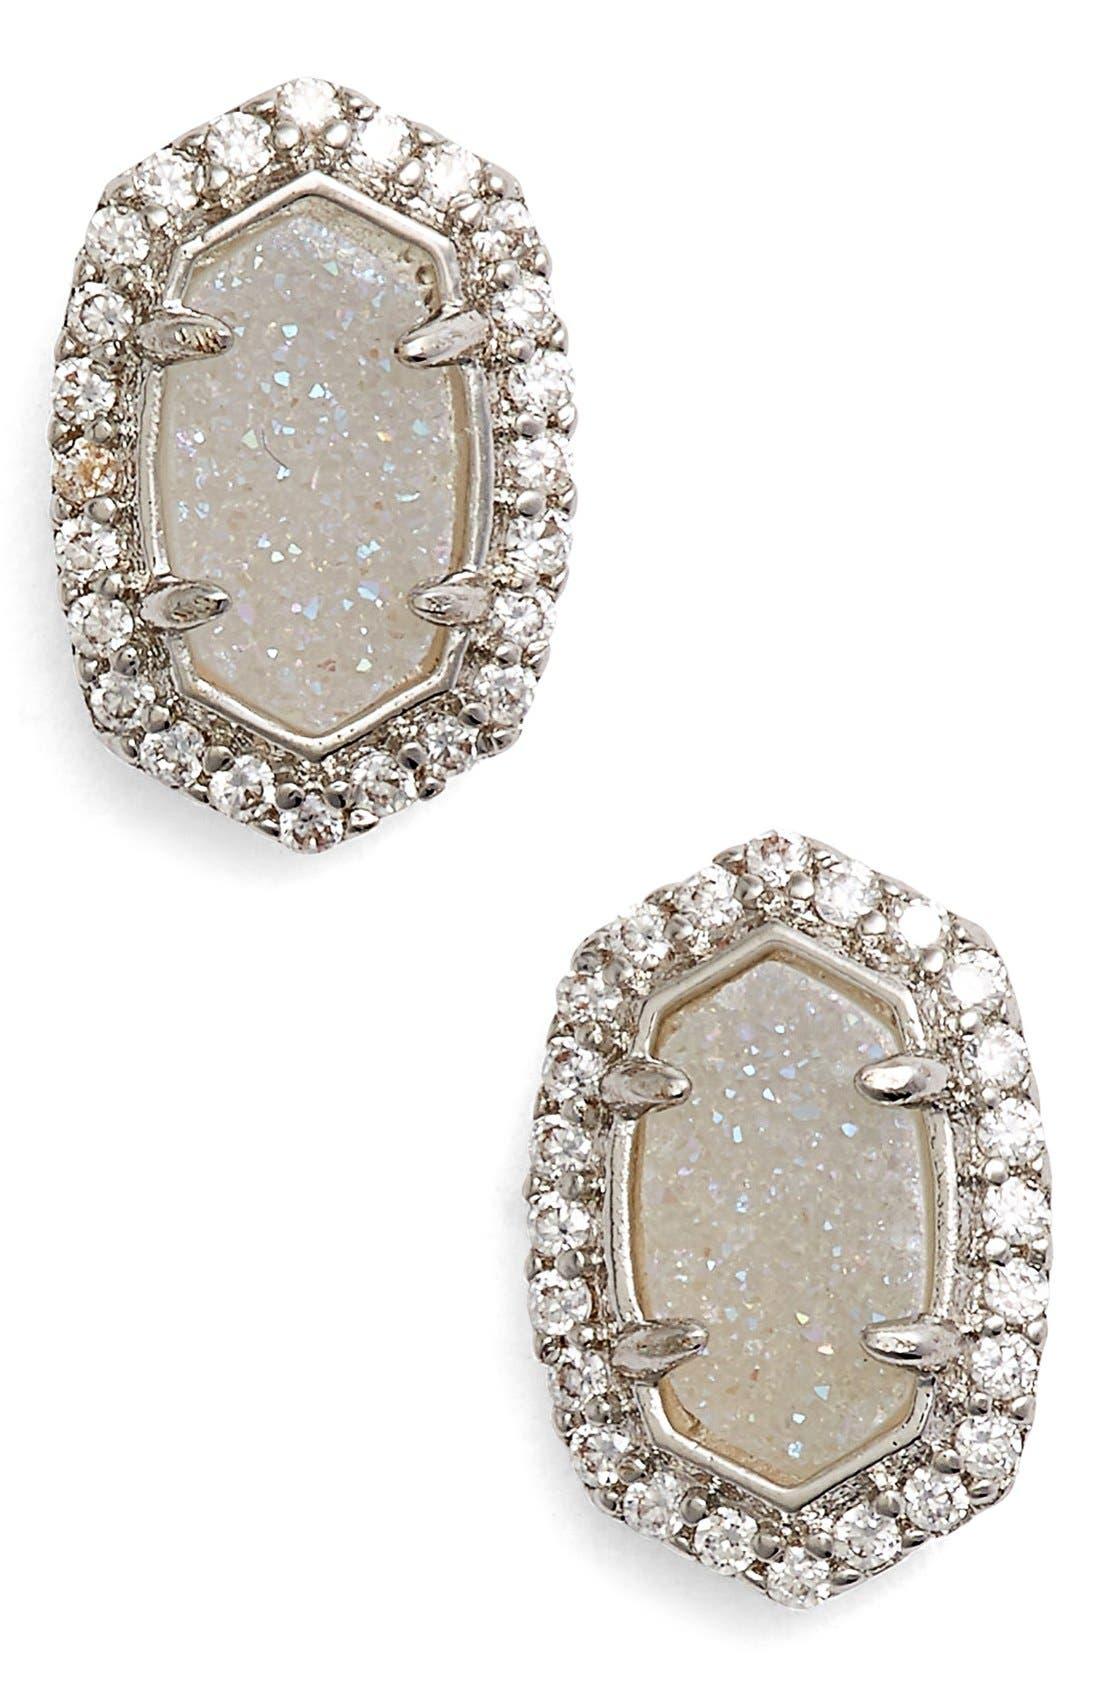 Alternate Image 1 Selected - Kendra Scott 'Cade' Drusy Stud Earrings